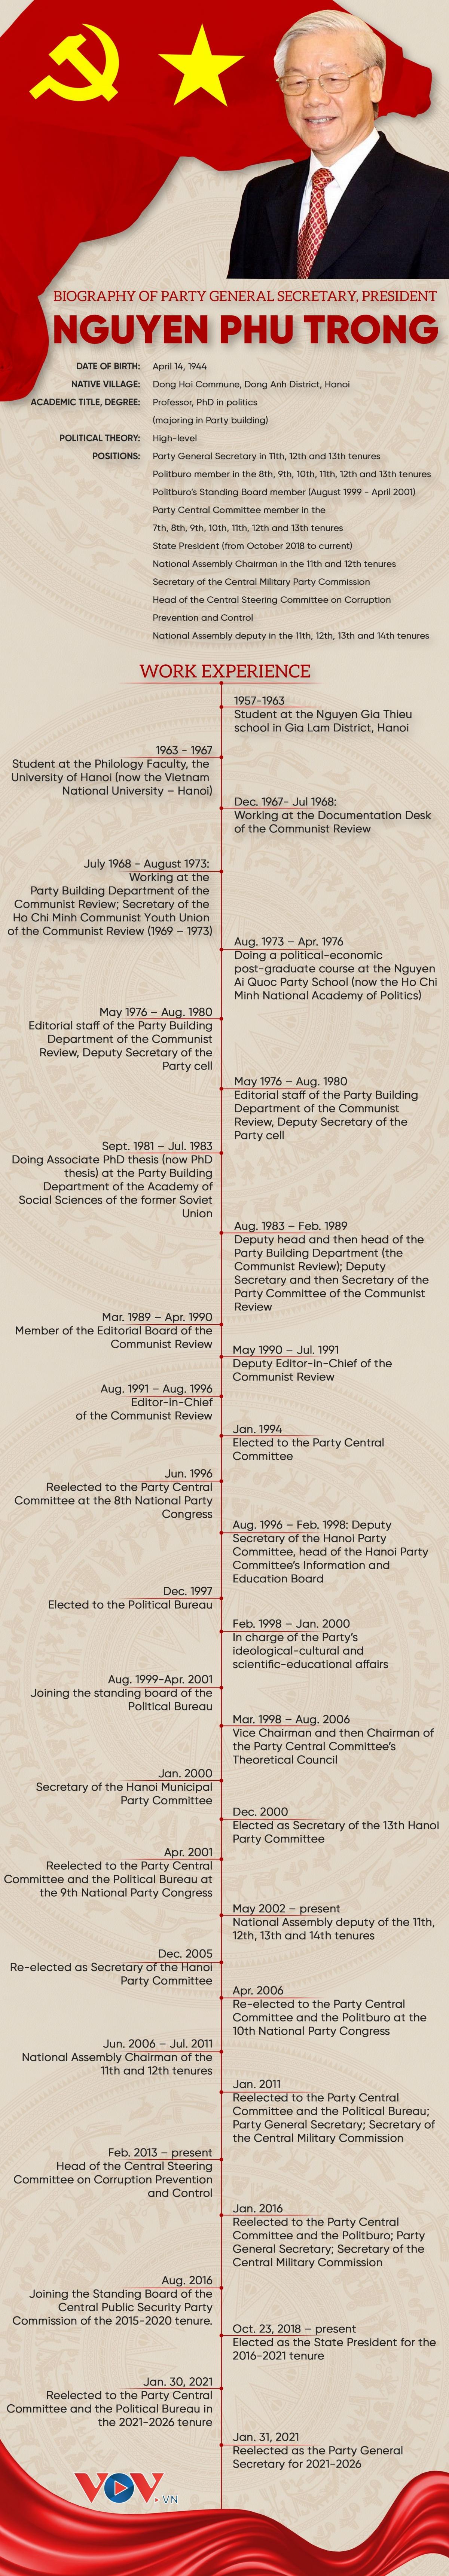 Vietnam General Secretary Nguyen Phu Trong: Biography & Career